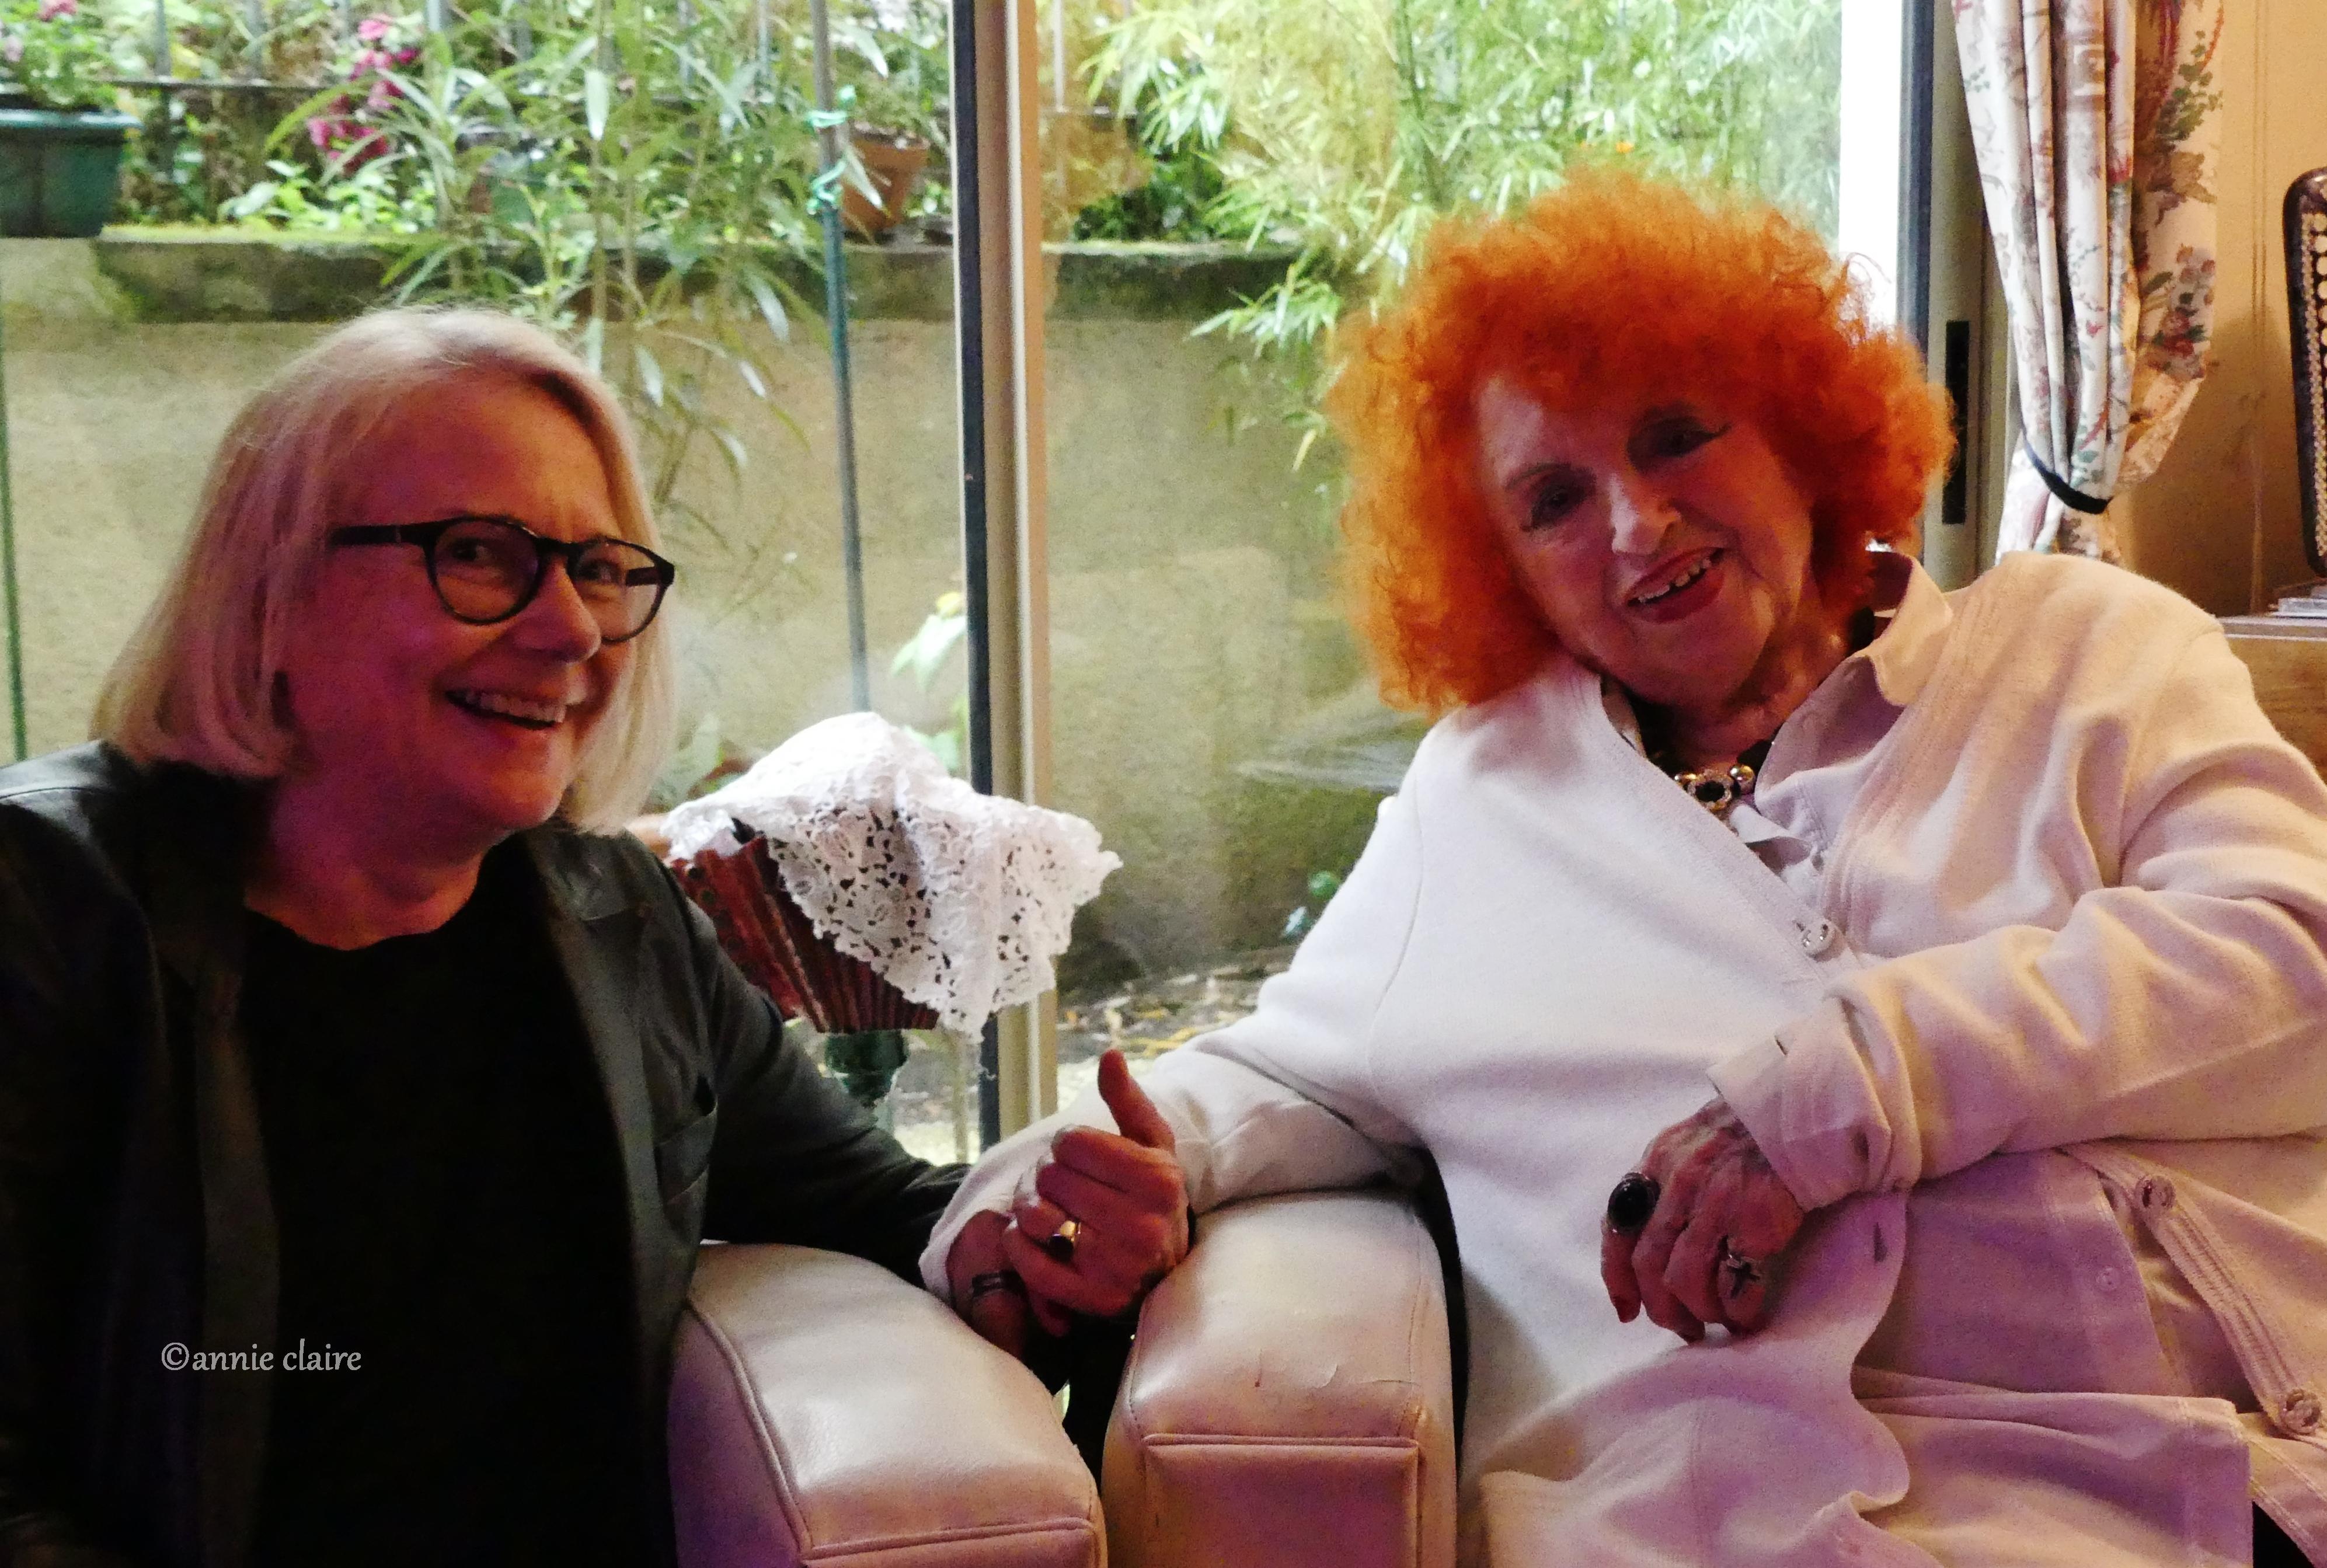 Yvette Horner et moi ©annie claire 10.05.2016